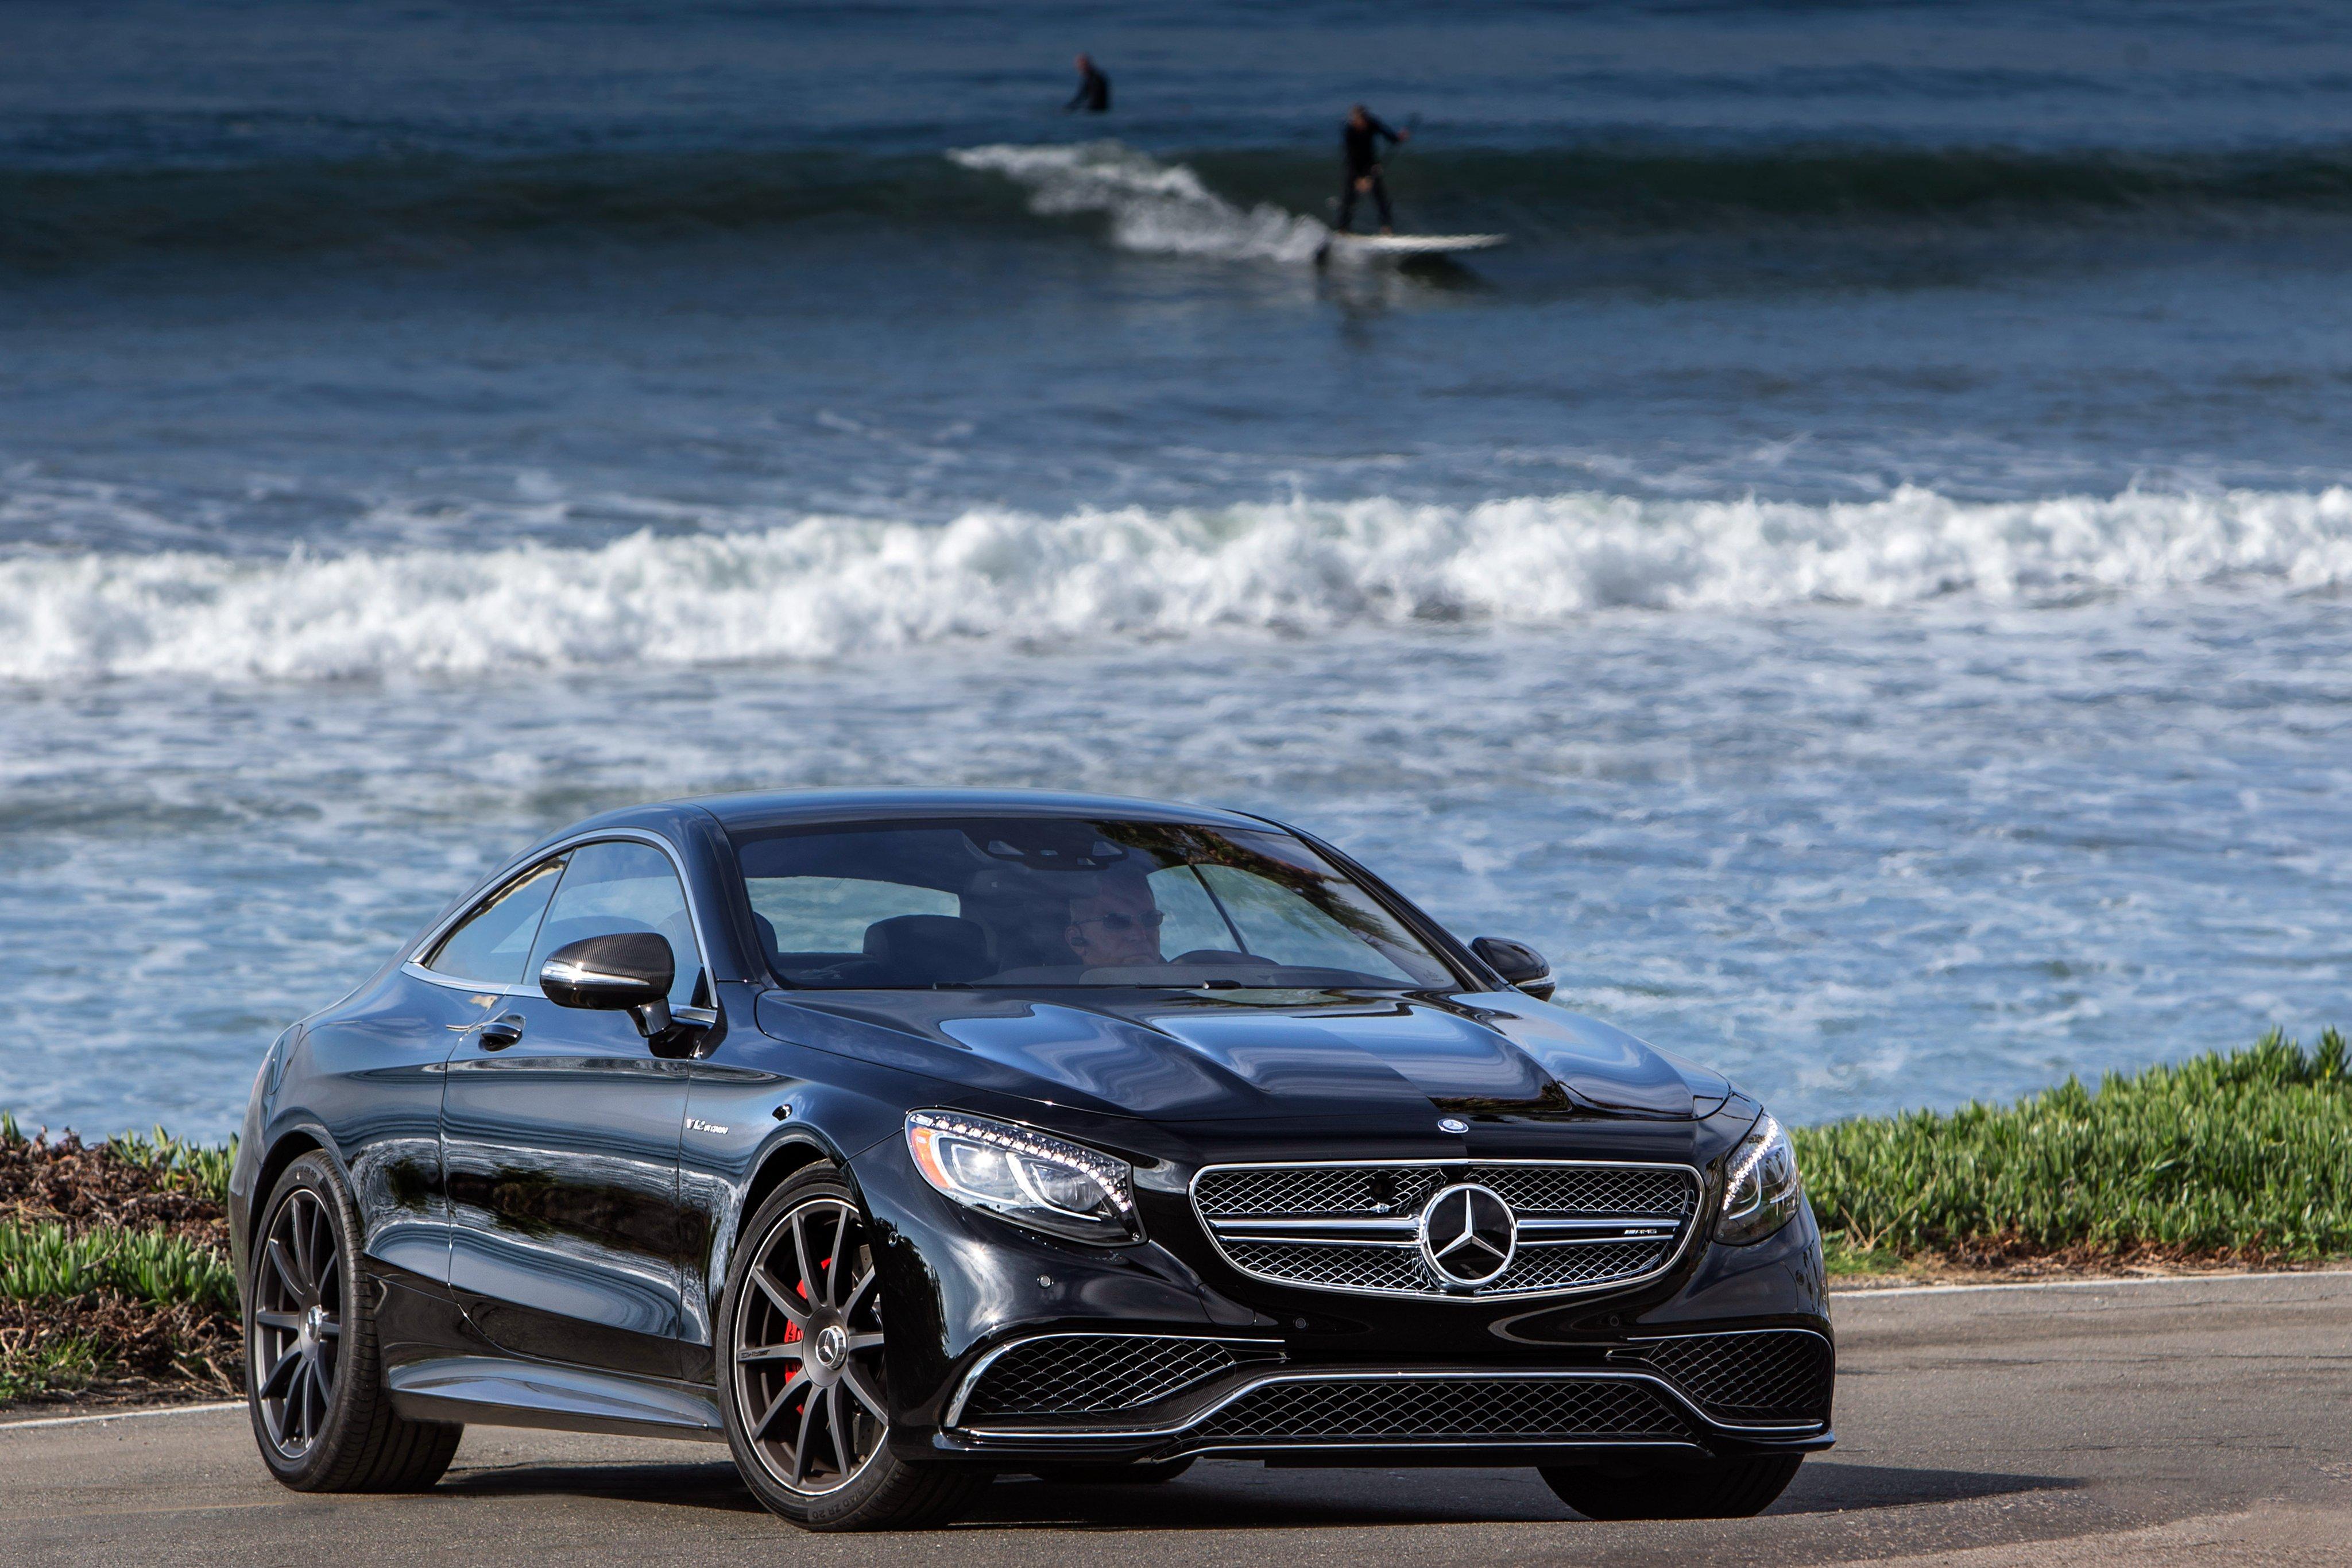 2015 mercedes benz s65 amg coupe us spec c217 wallpaper - 2015 Mercedes S65 Amg